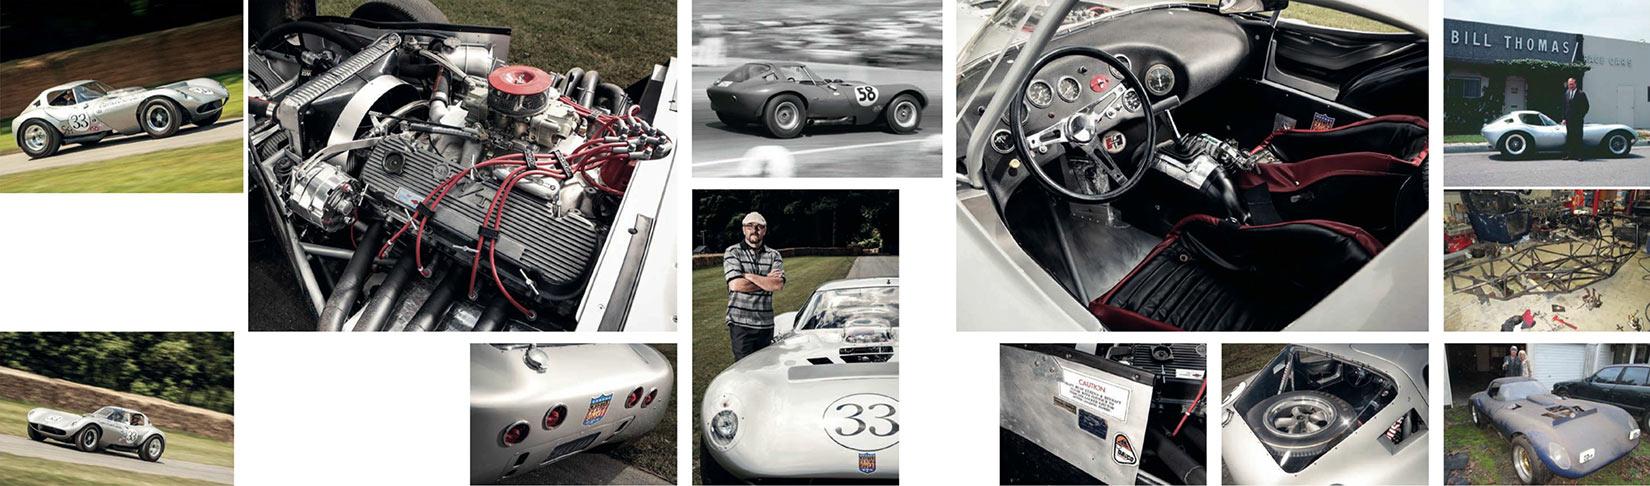 1963 Cheetah 550bhp monster road-test